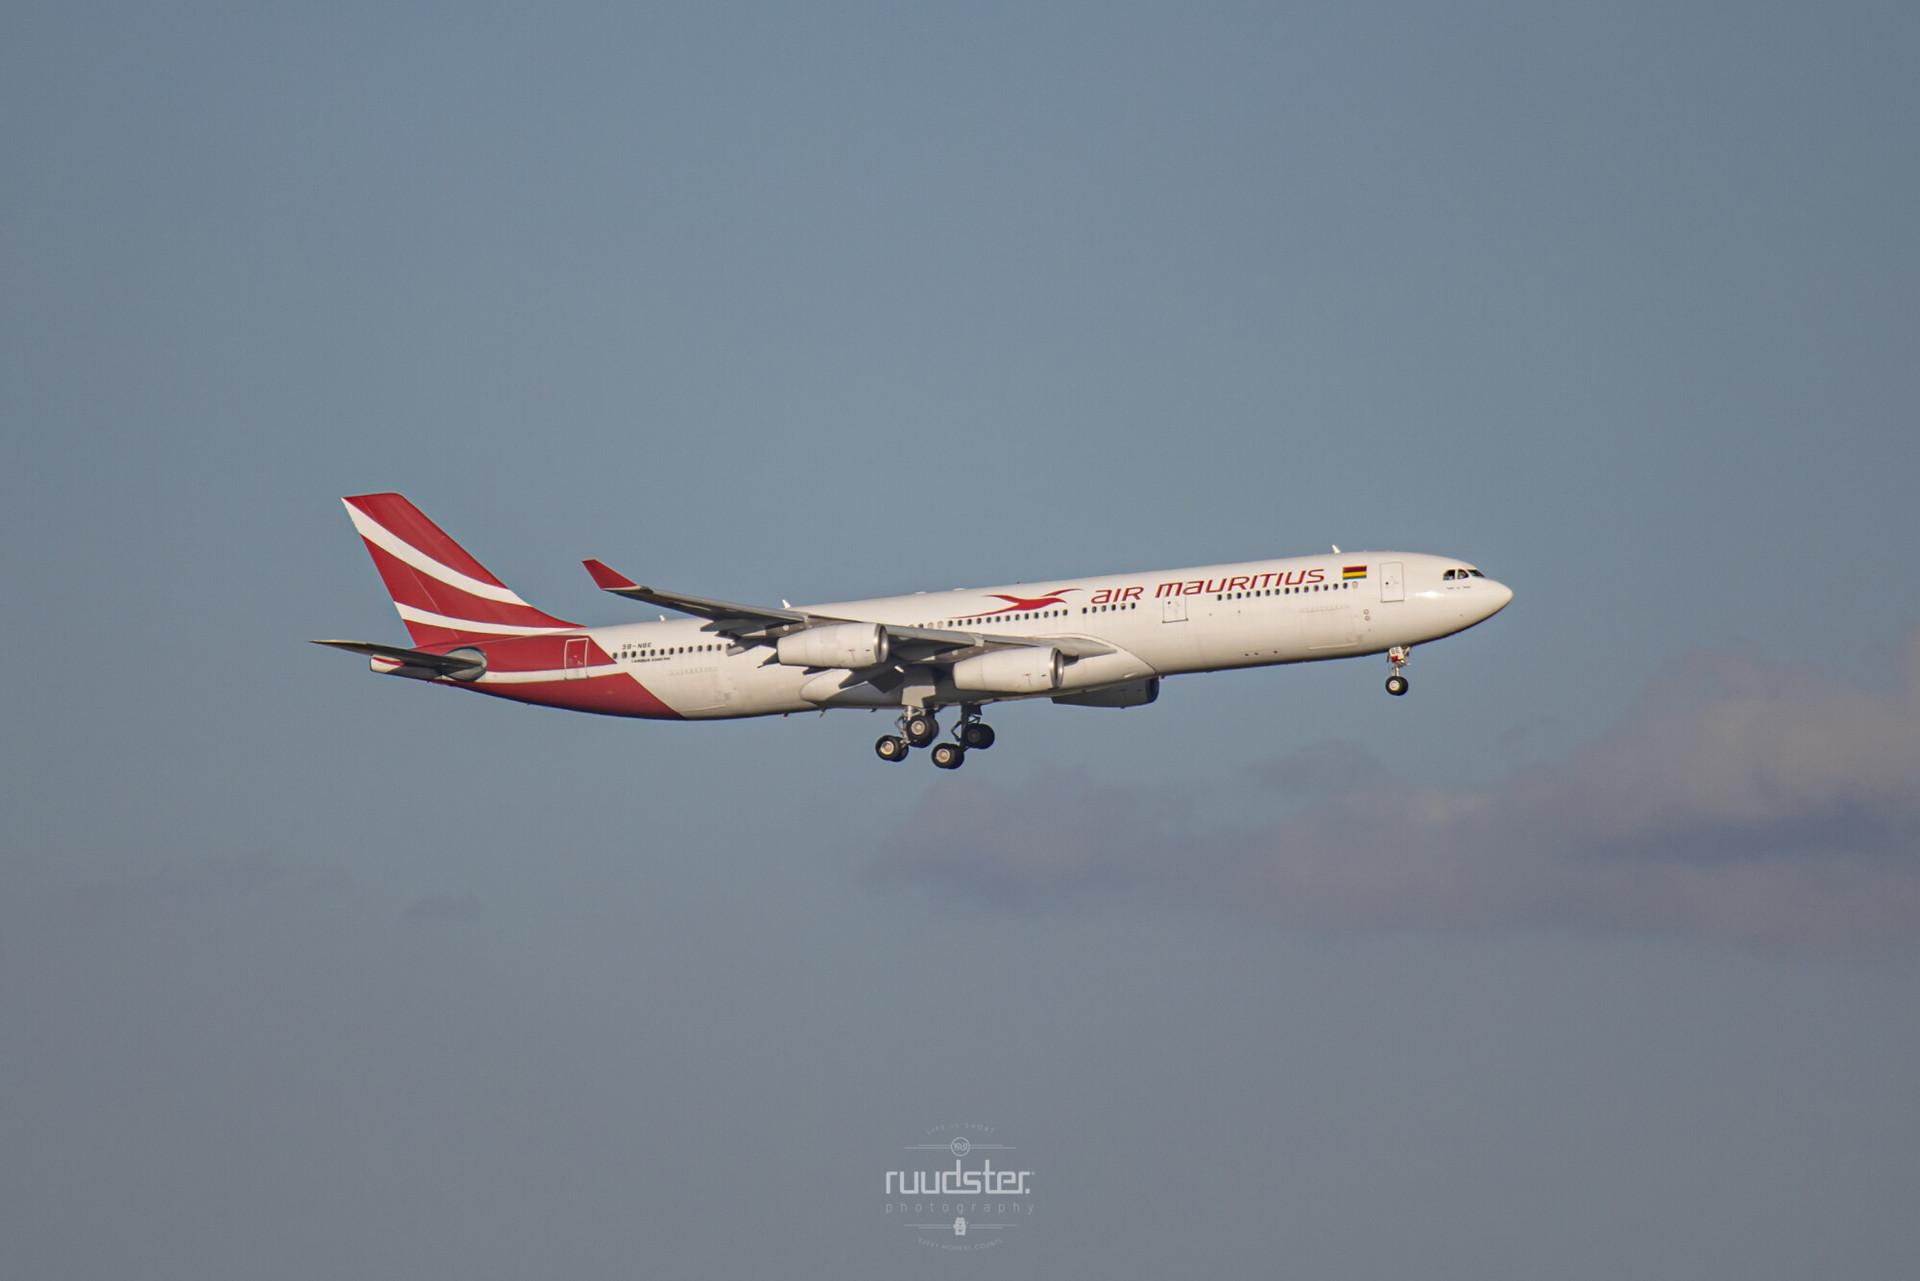 3B-NBE   Build: 1999 - Airbus A340-313X